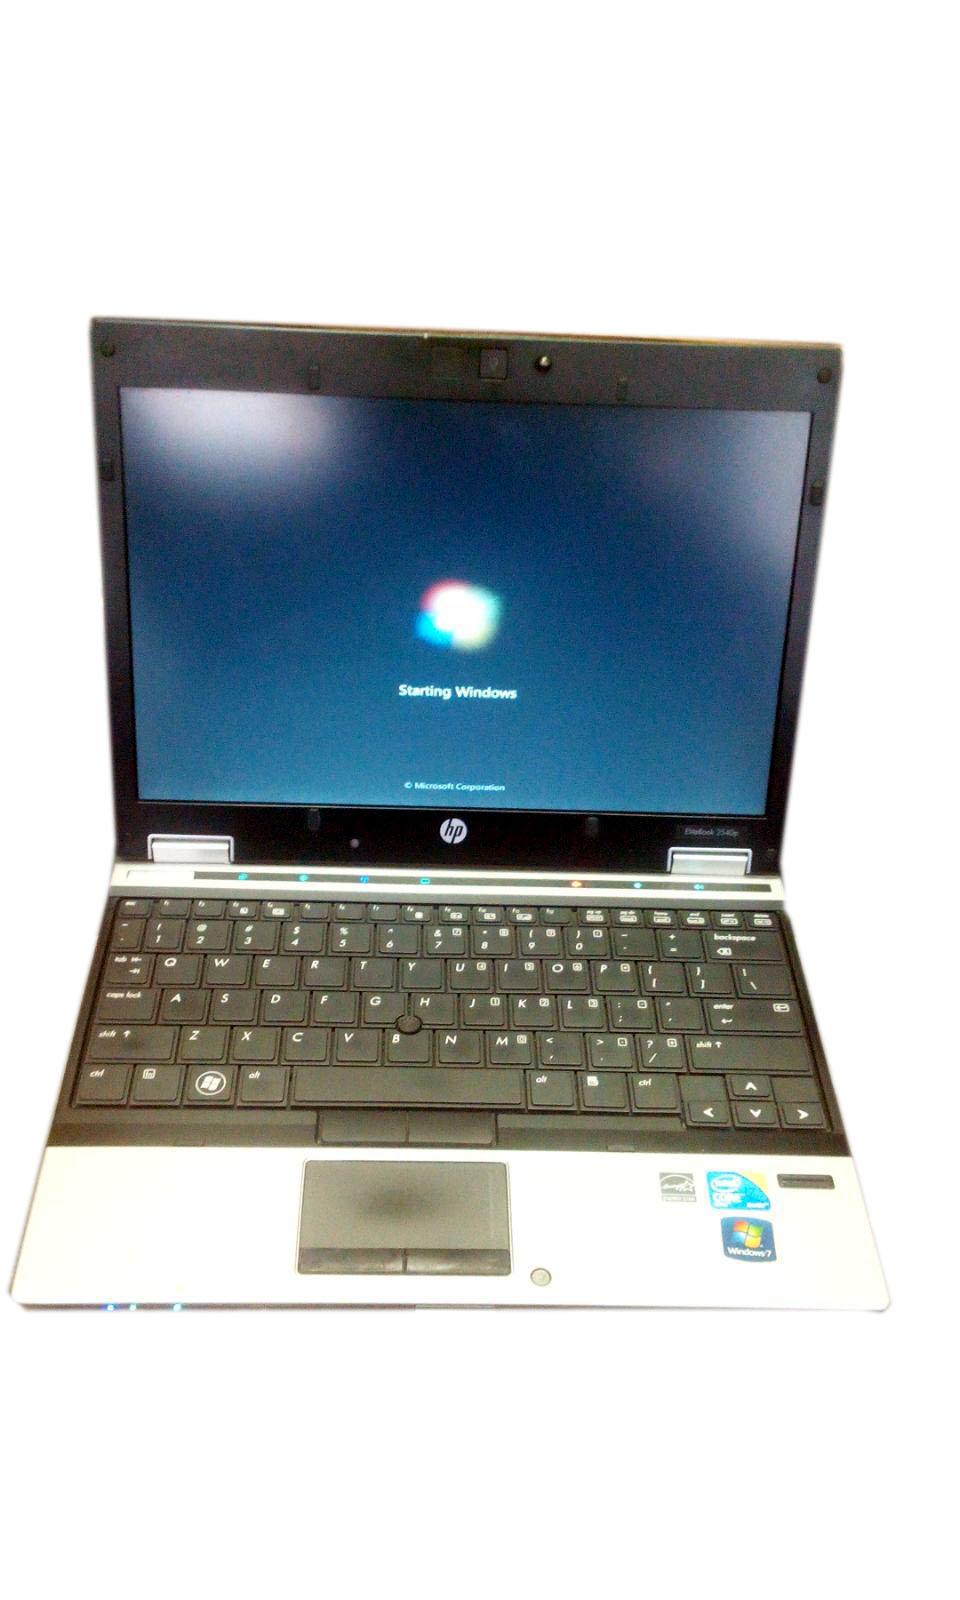 Used HP Elitebook 2540p i7 Processor